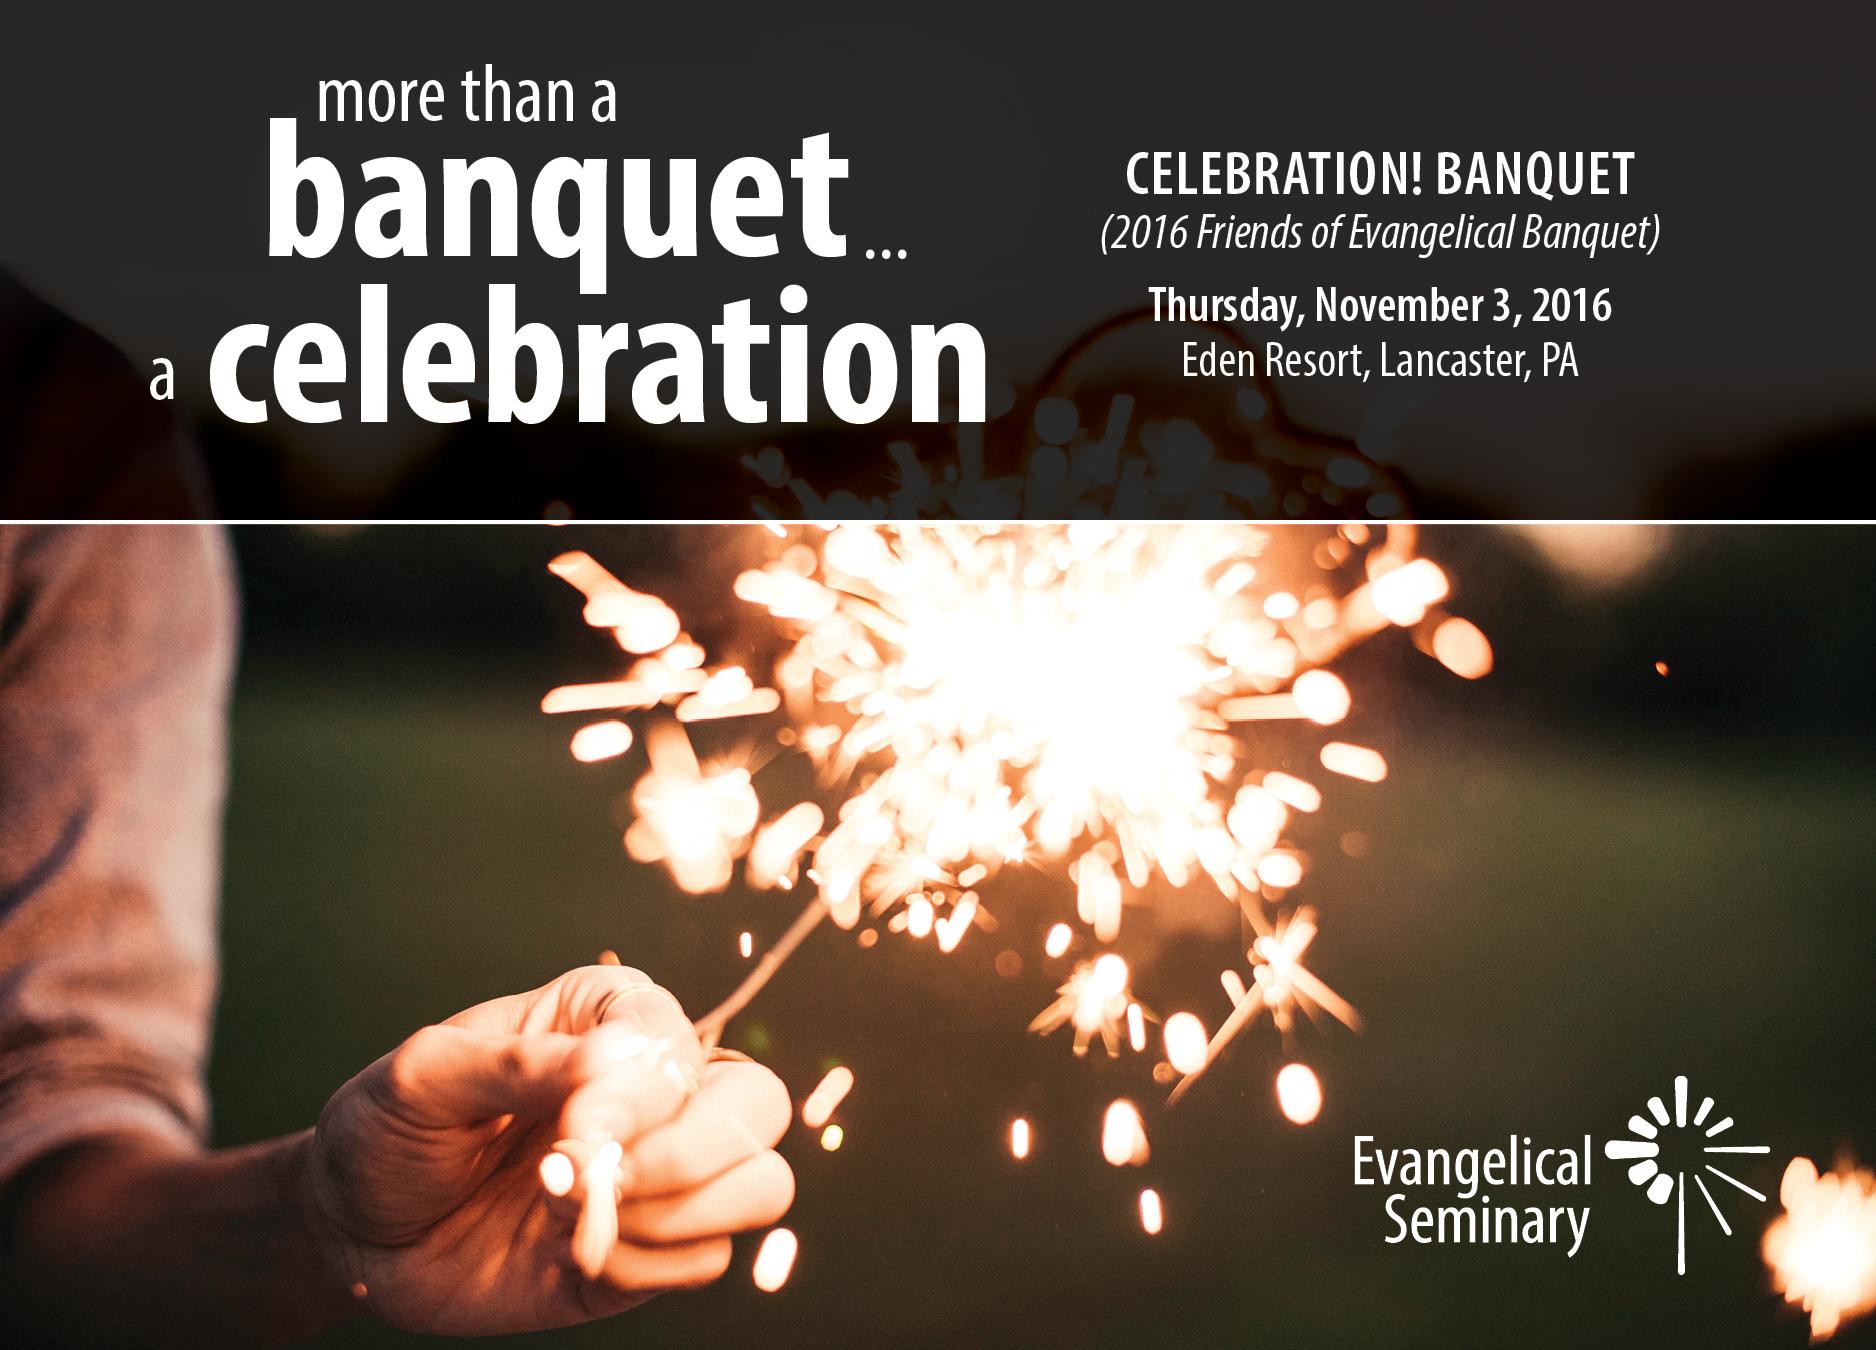 es-16-014-celebration-banquet-front-jpg